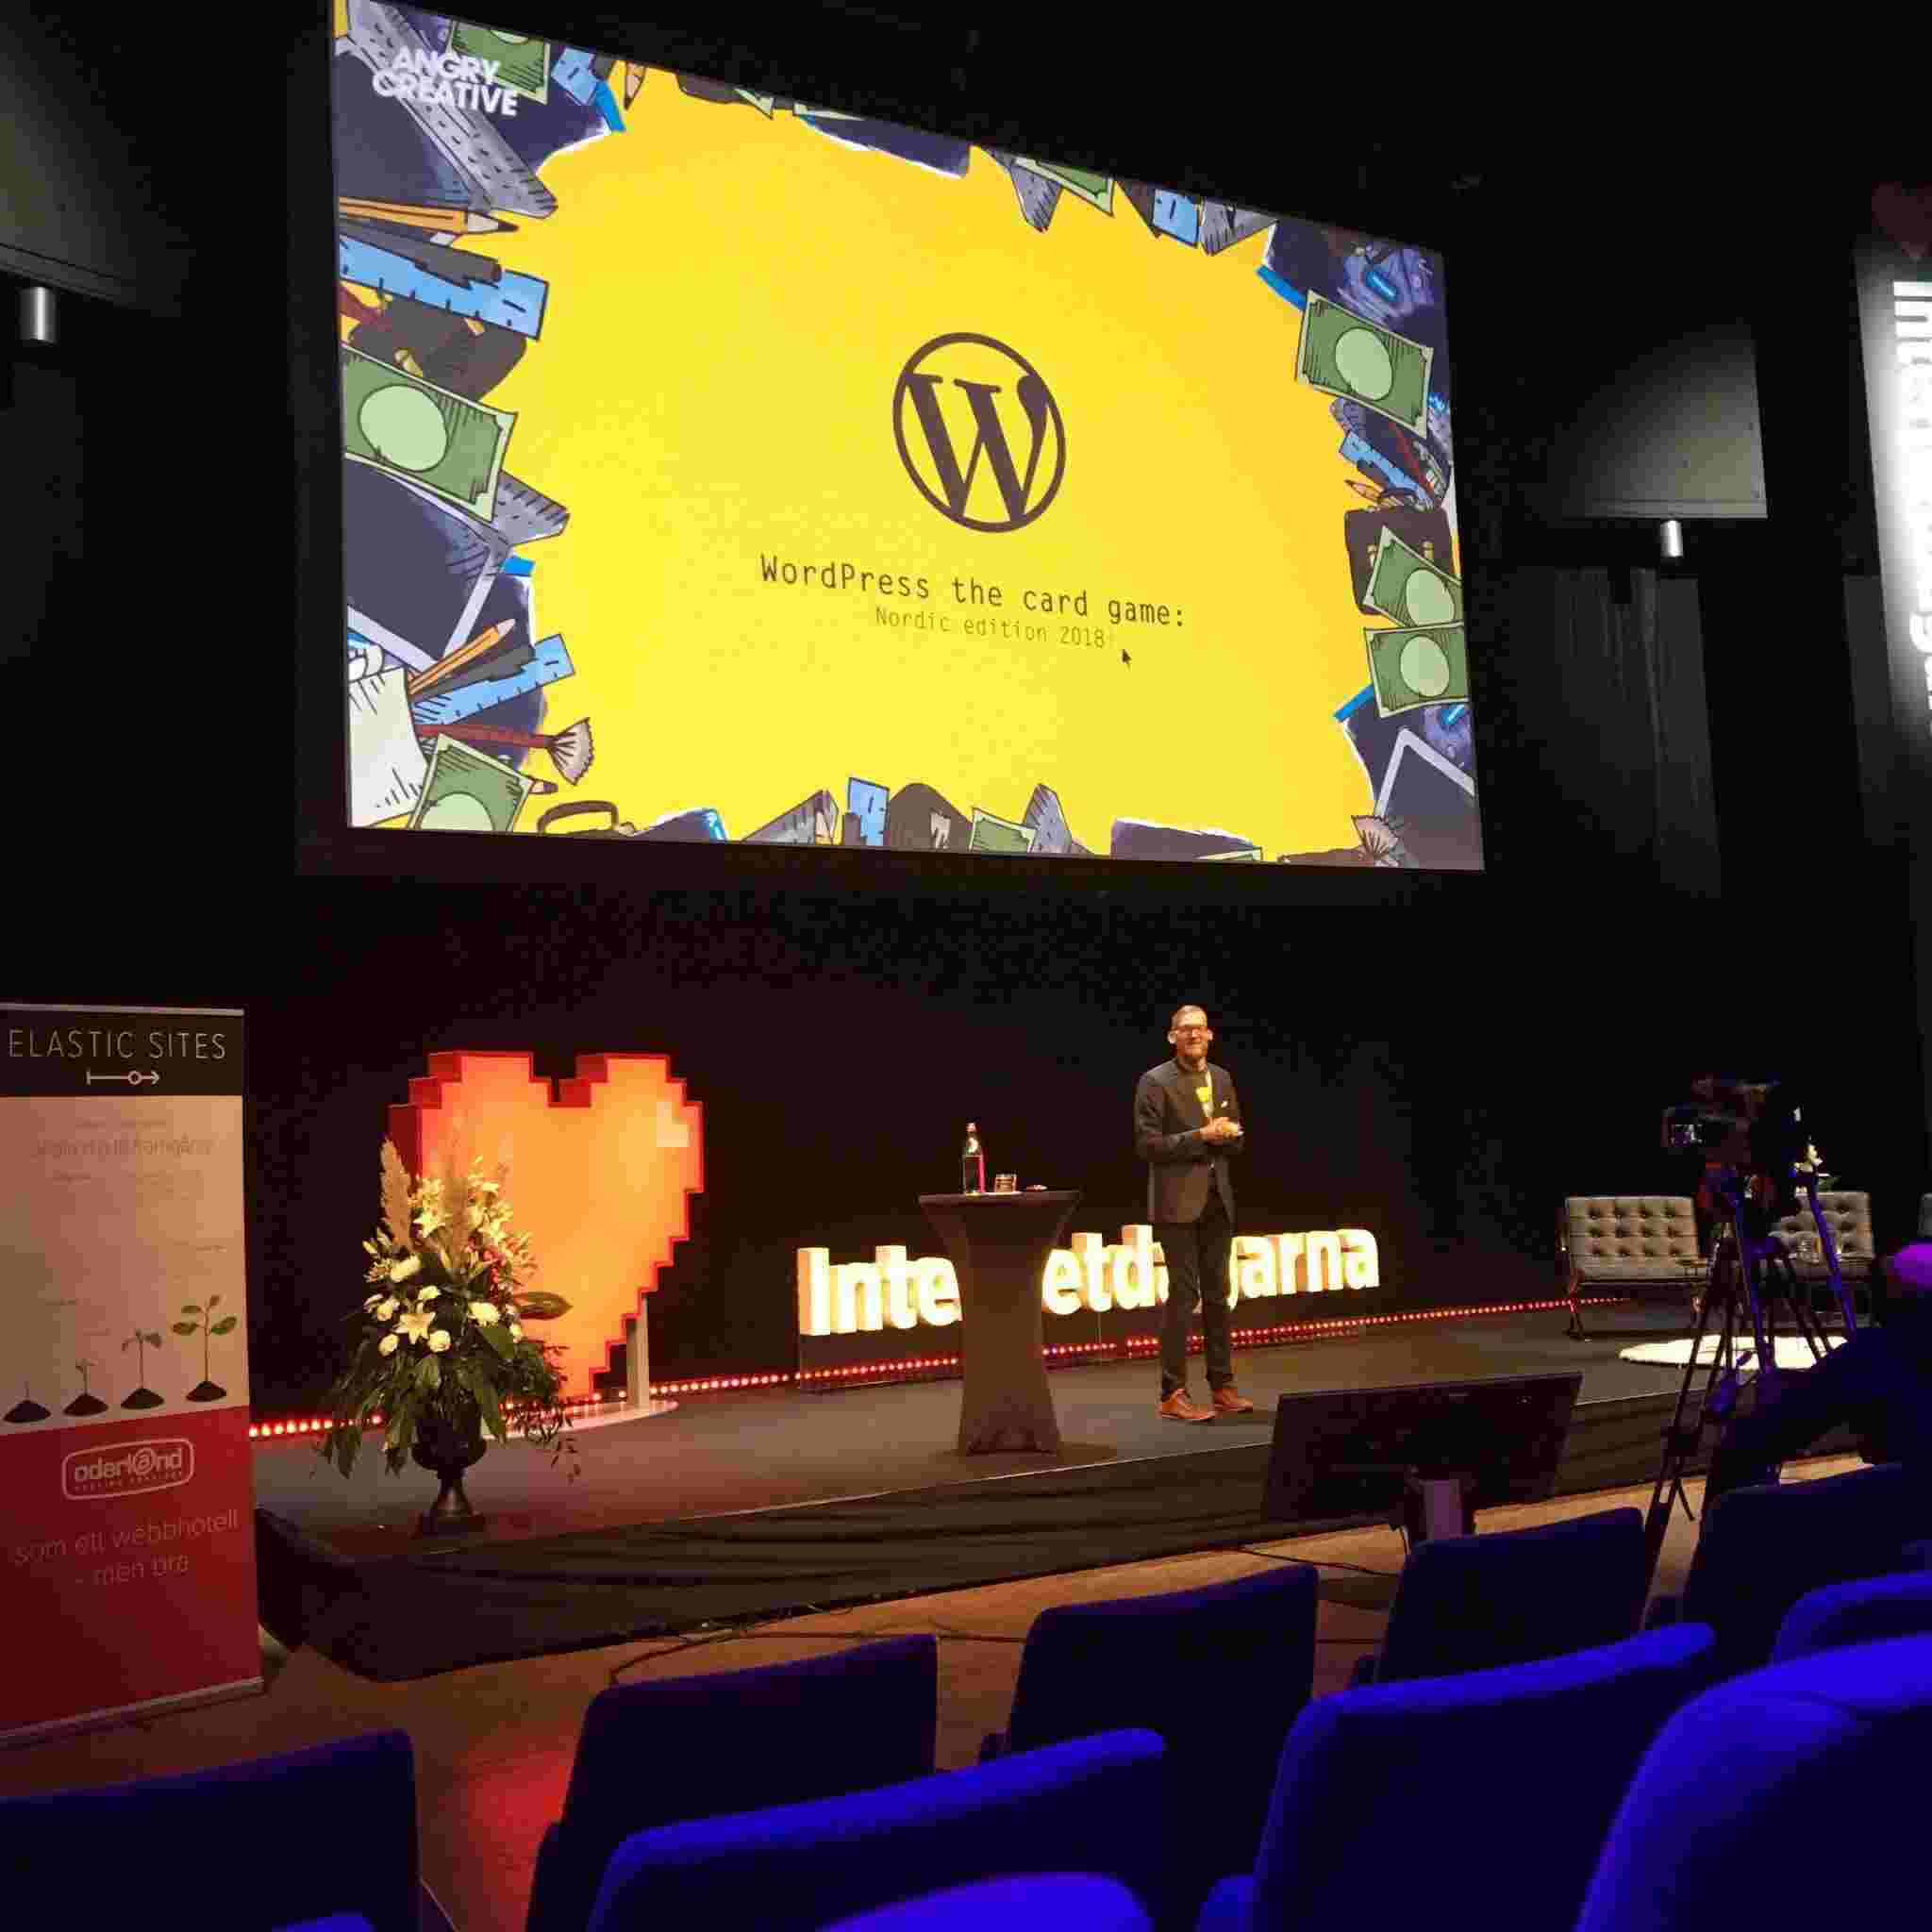 WordCamp Stockholm 2017 & WordPress the Card Game